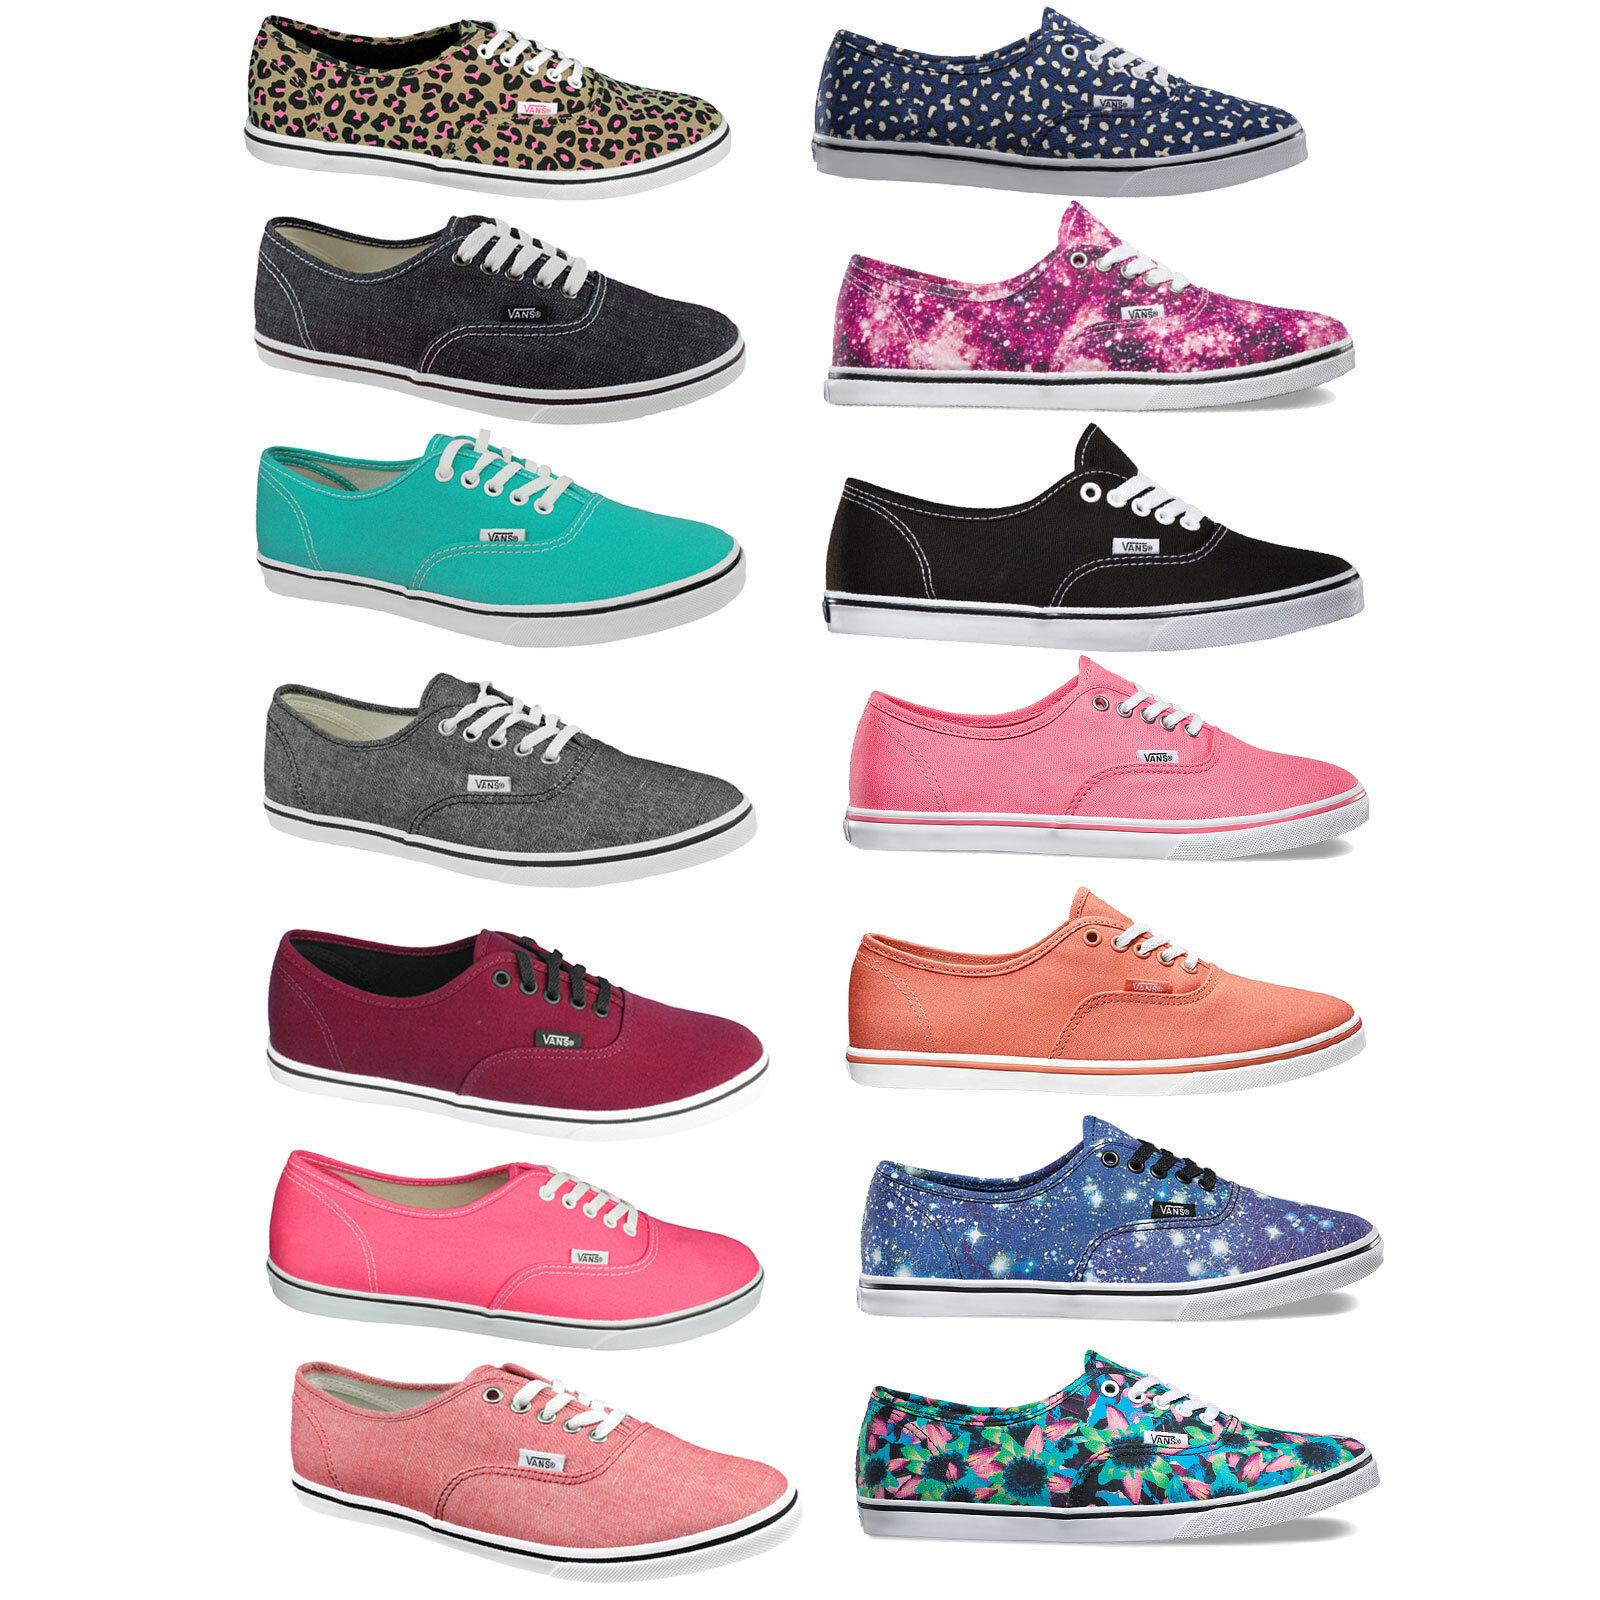 Vans Authentic Lo Pro Women's Sneaker Textile Shoes Casual Summer NEW